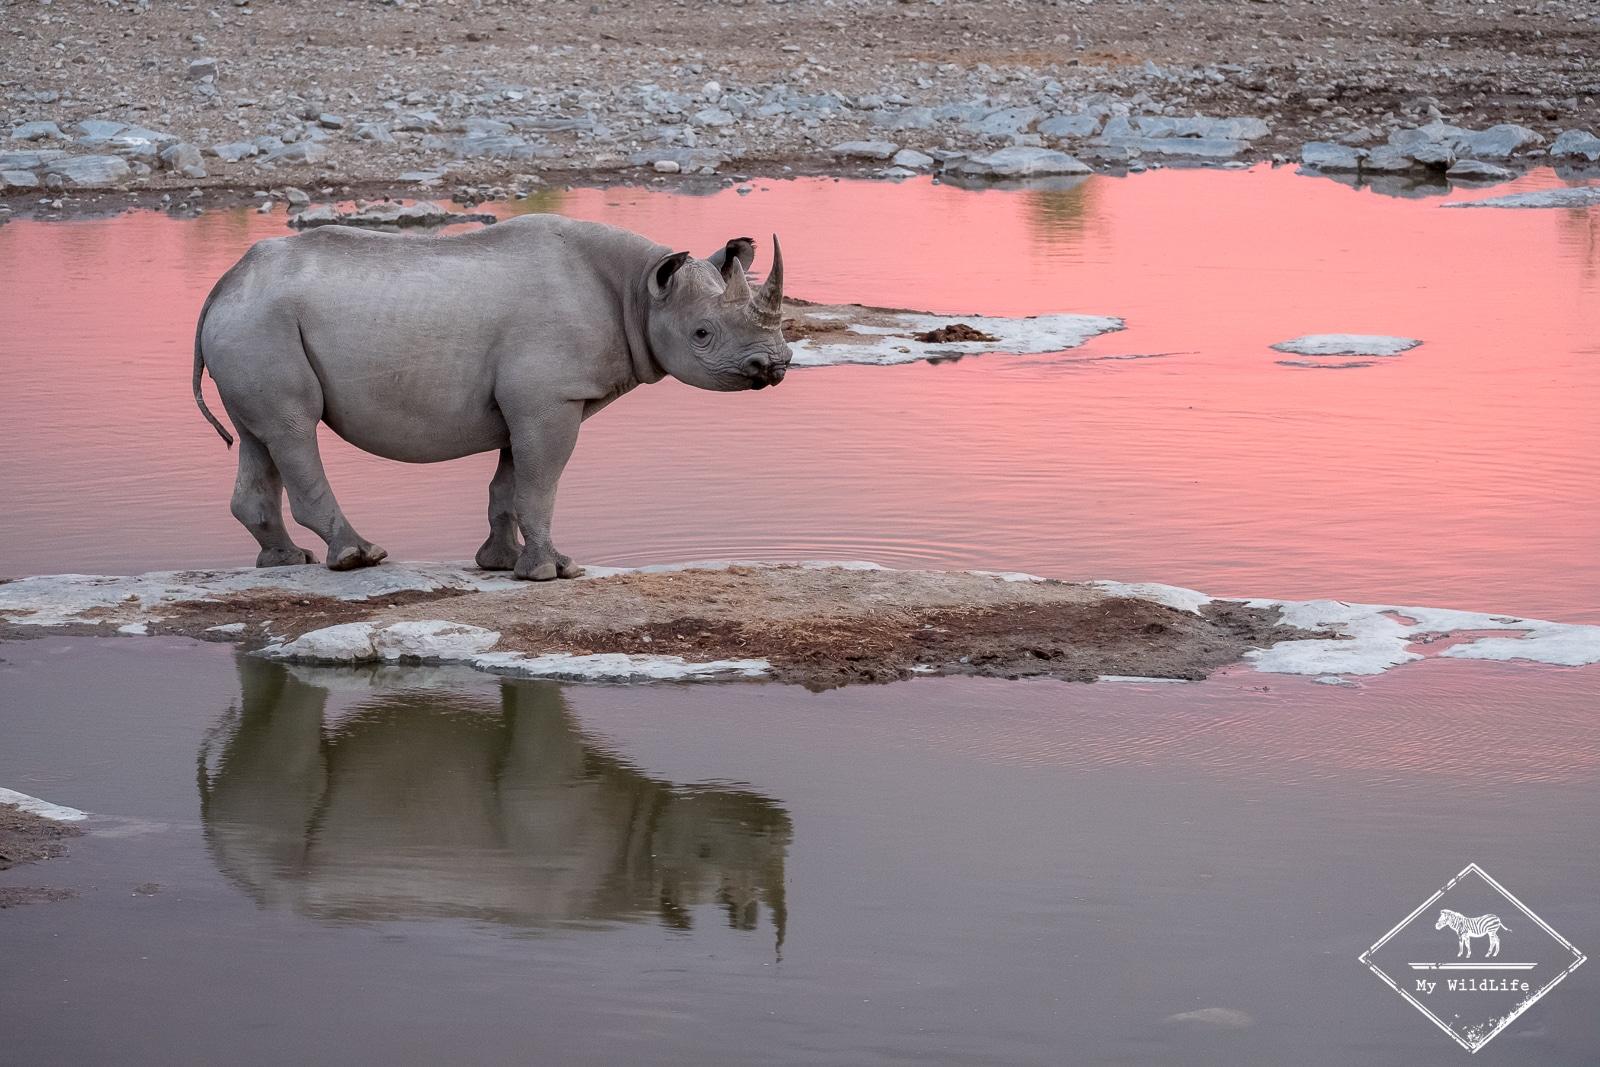 Rhinocéros au waterhole d'Halali, parc national d'Etosha